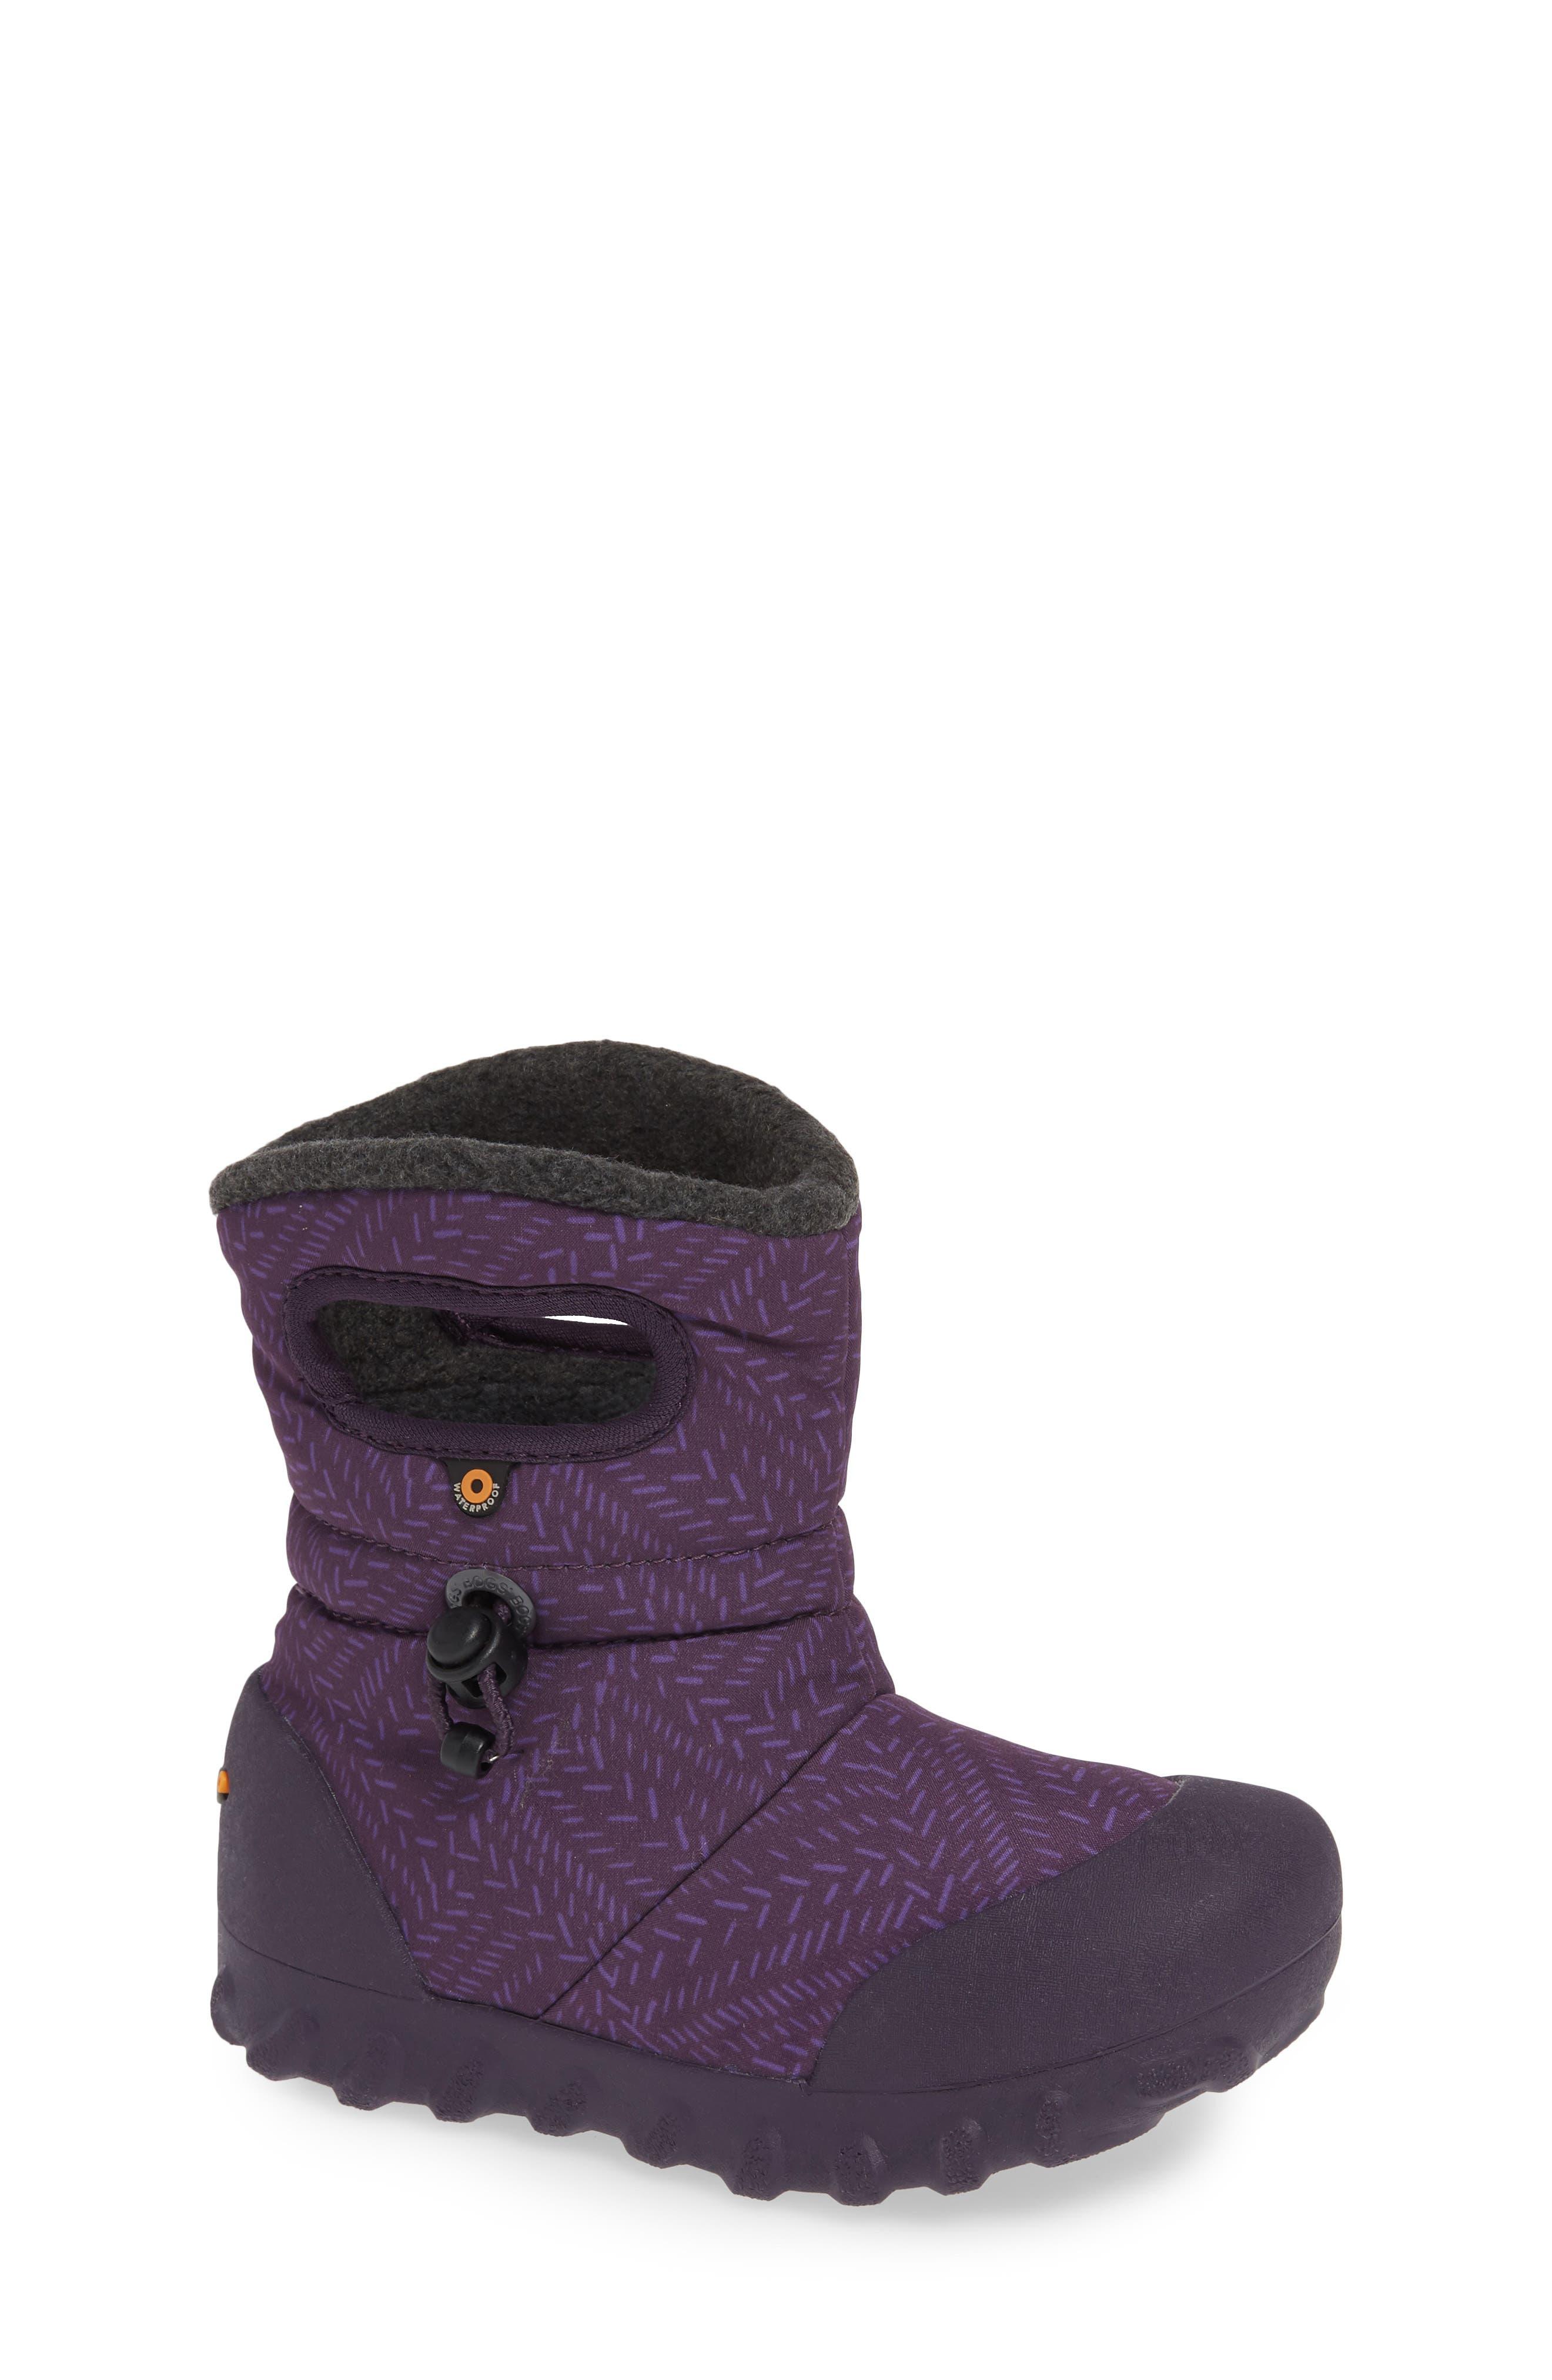 Bogs B-Moc Fleck Waterproof Insulated Faux Fur Boot